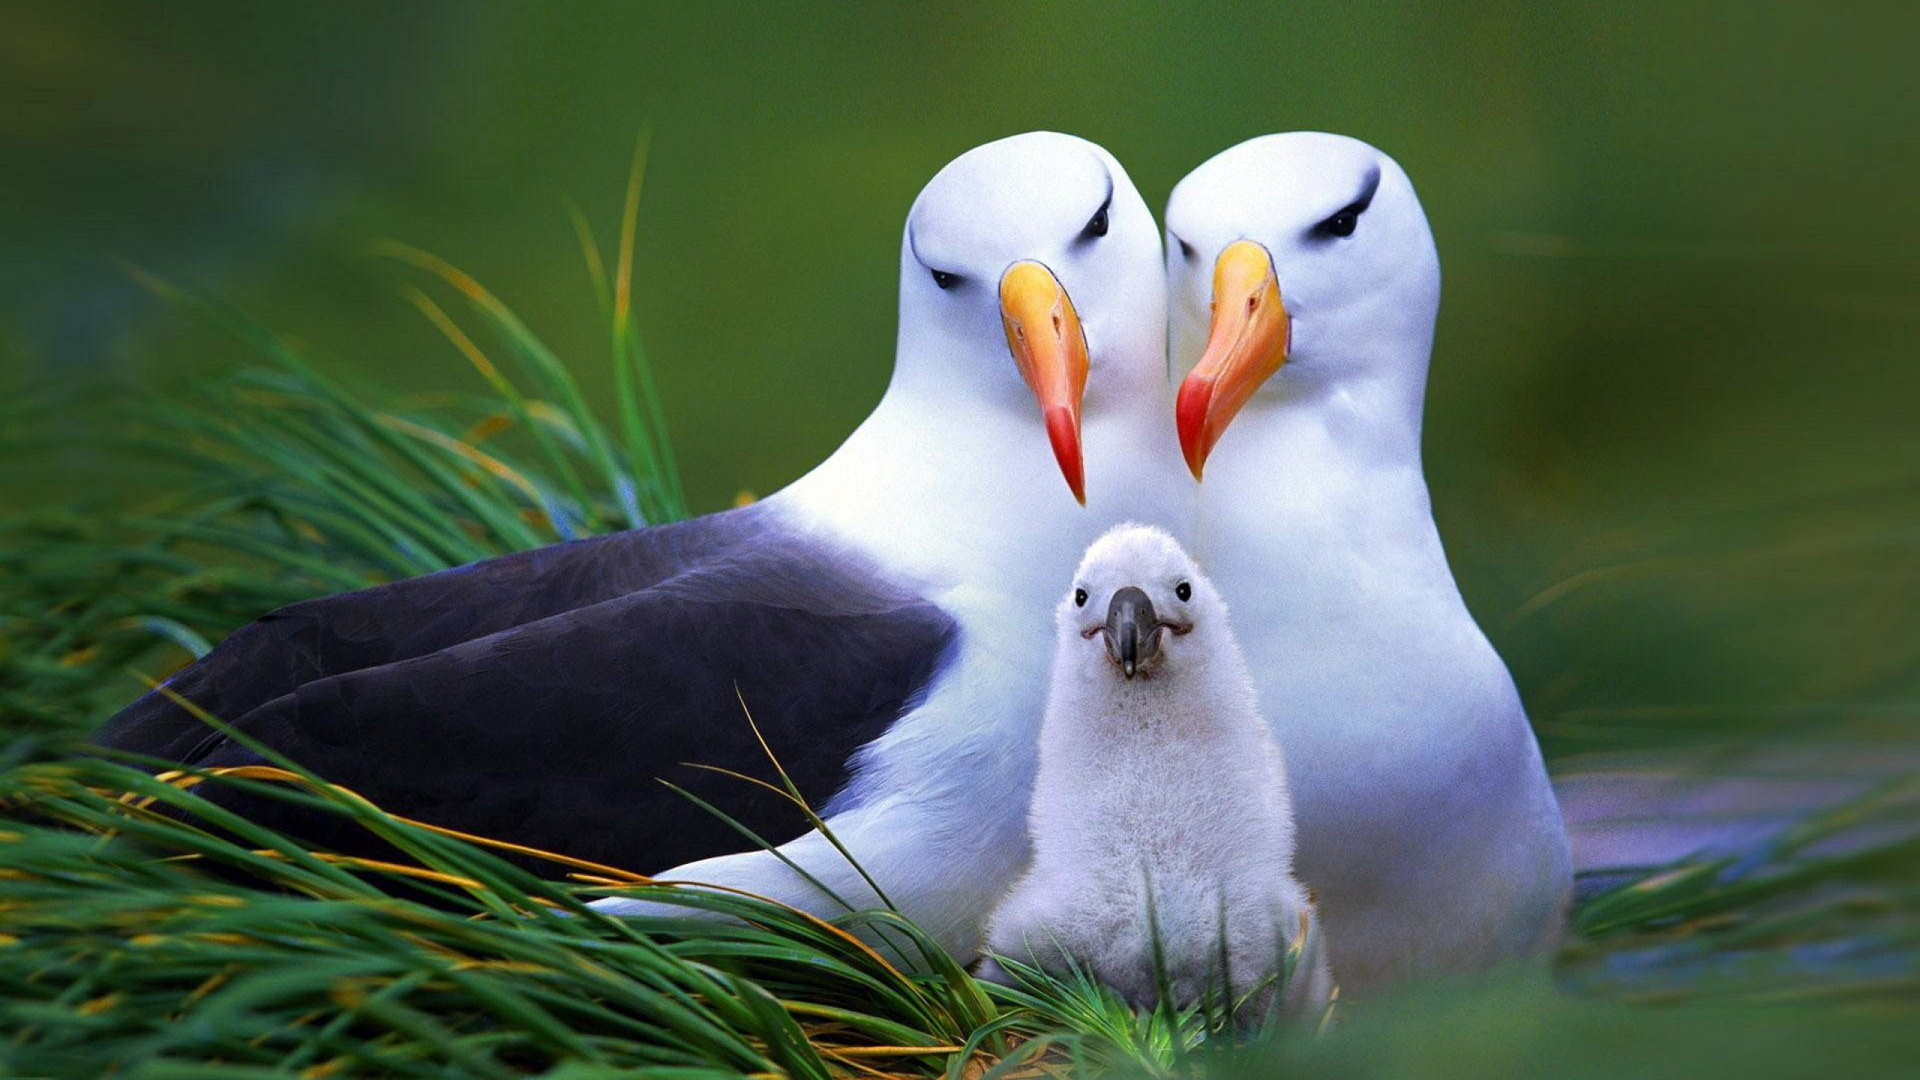 Картинки на весь экран птицы